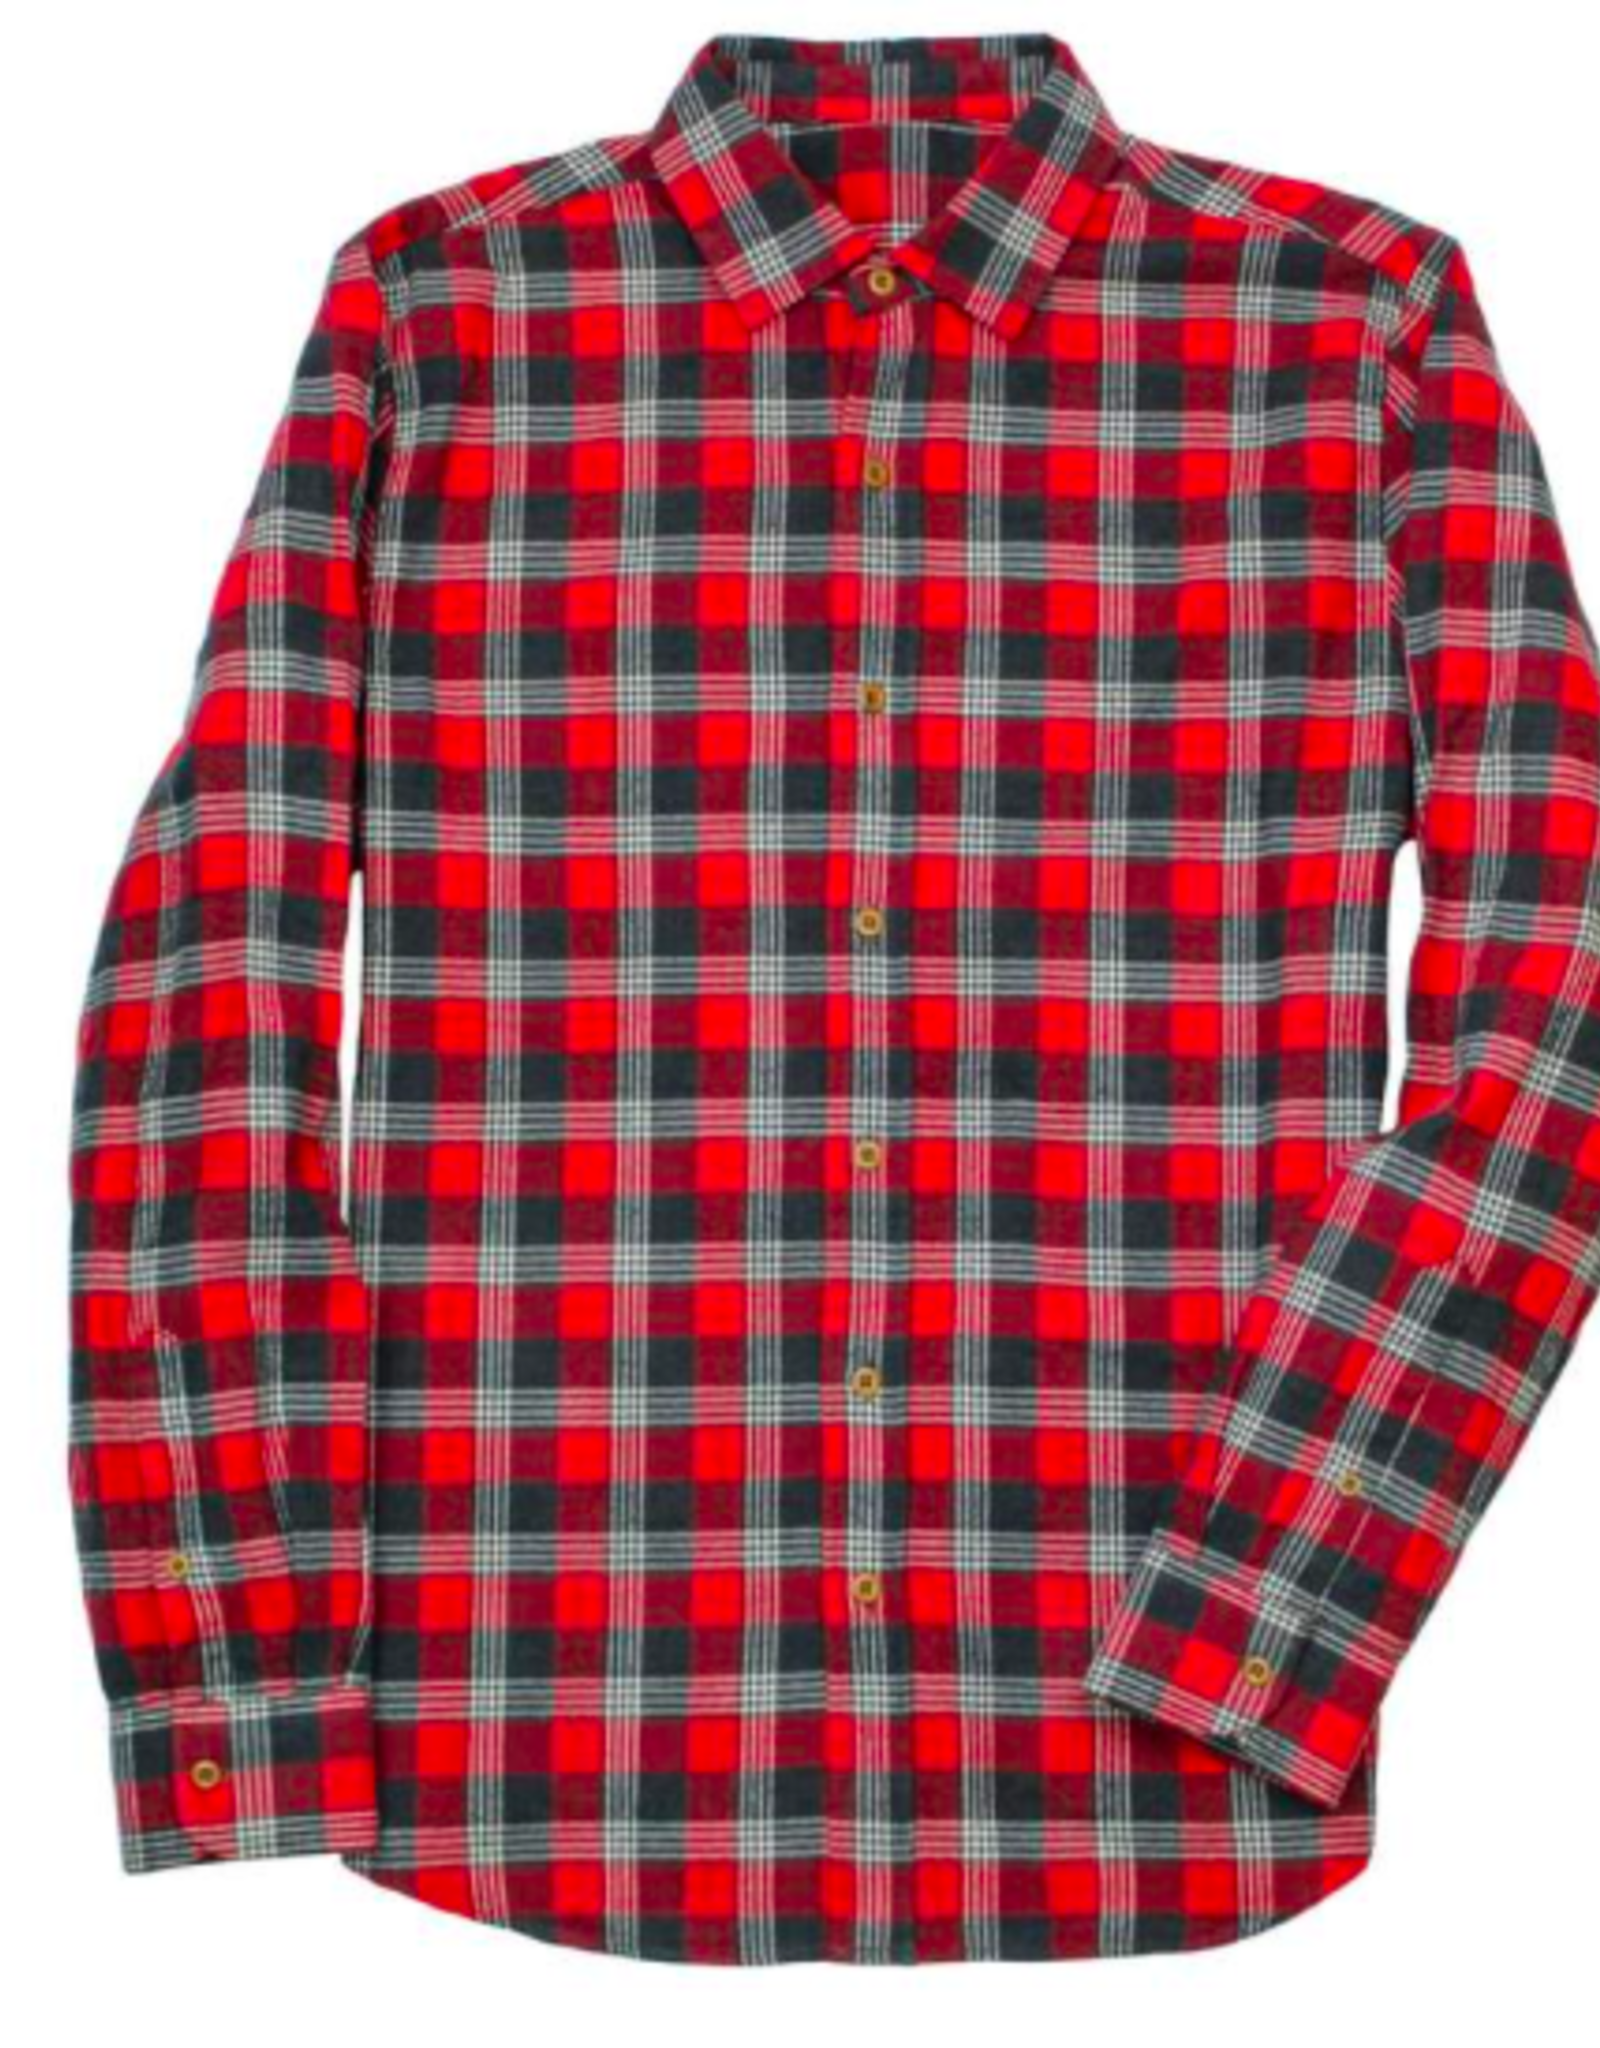 Southern Proper Lauderdale Shirt